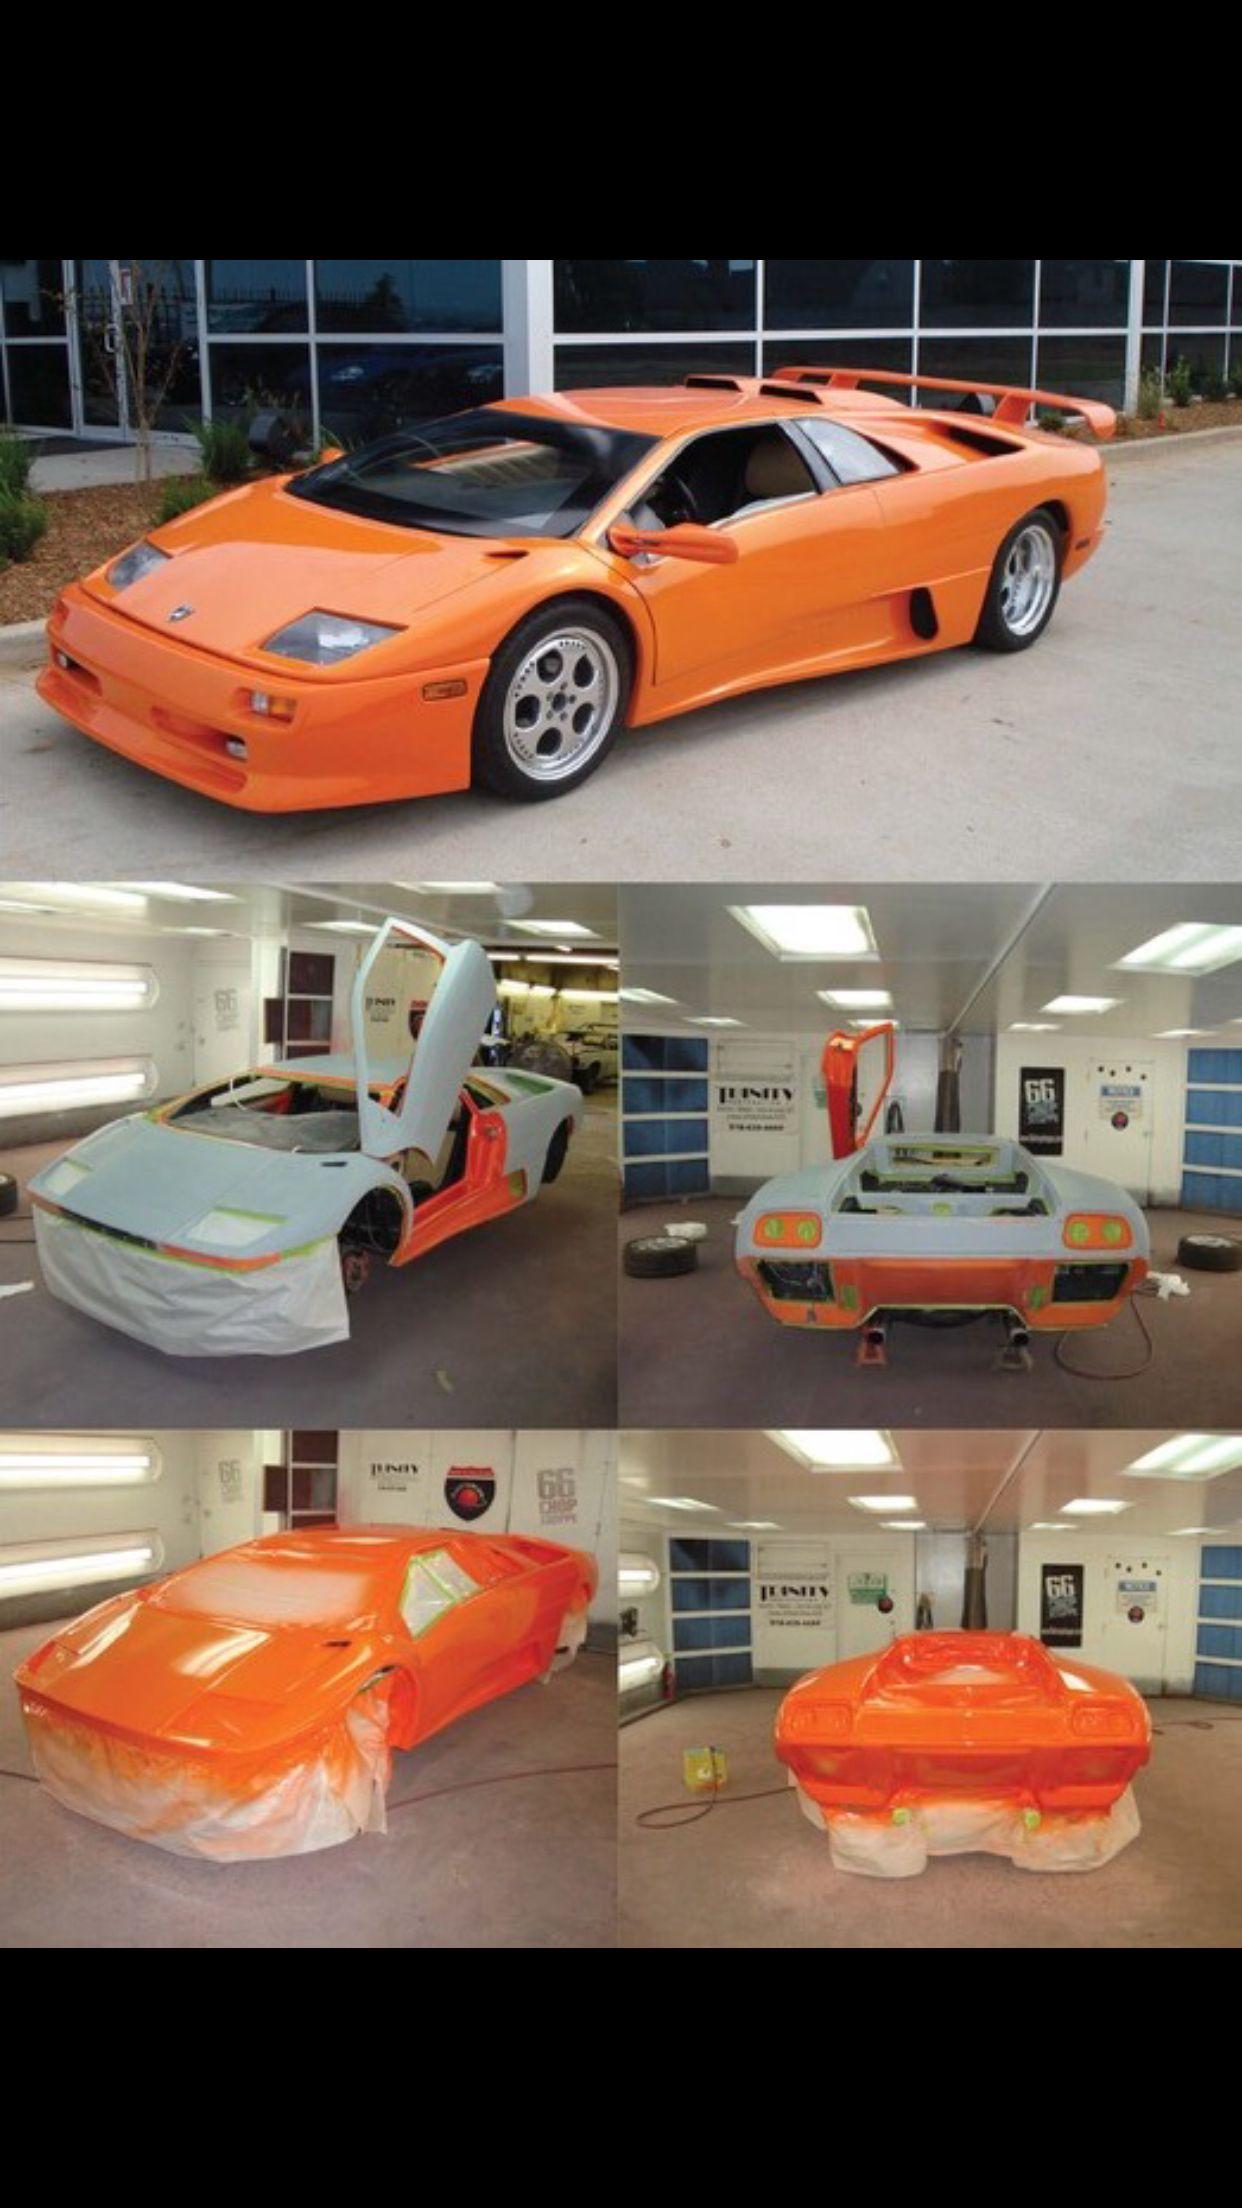 Factory Lamborghini Orange Paint Baby Gotta Love That Color It Had